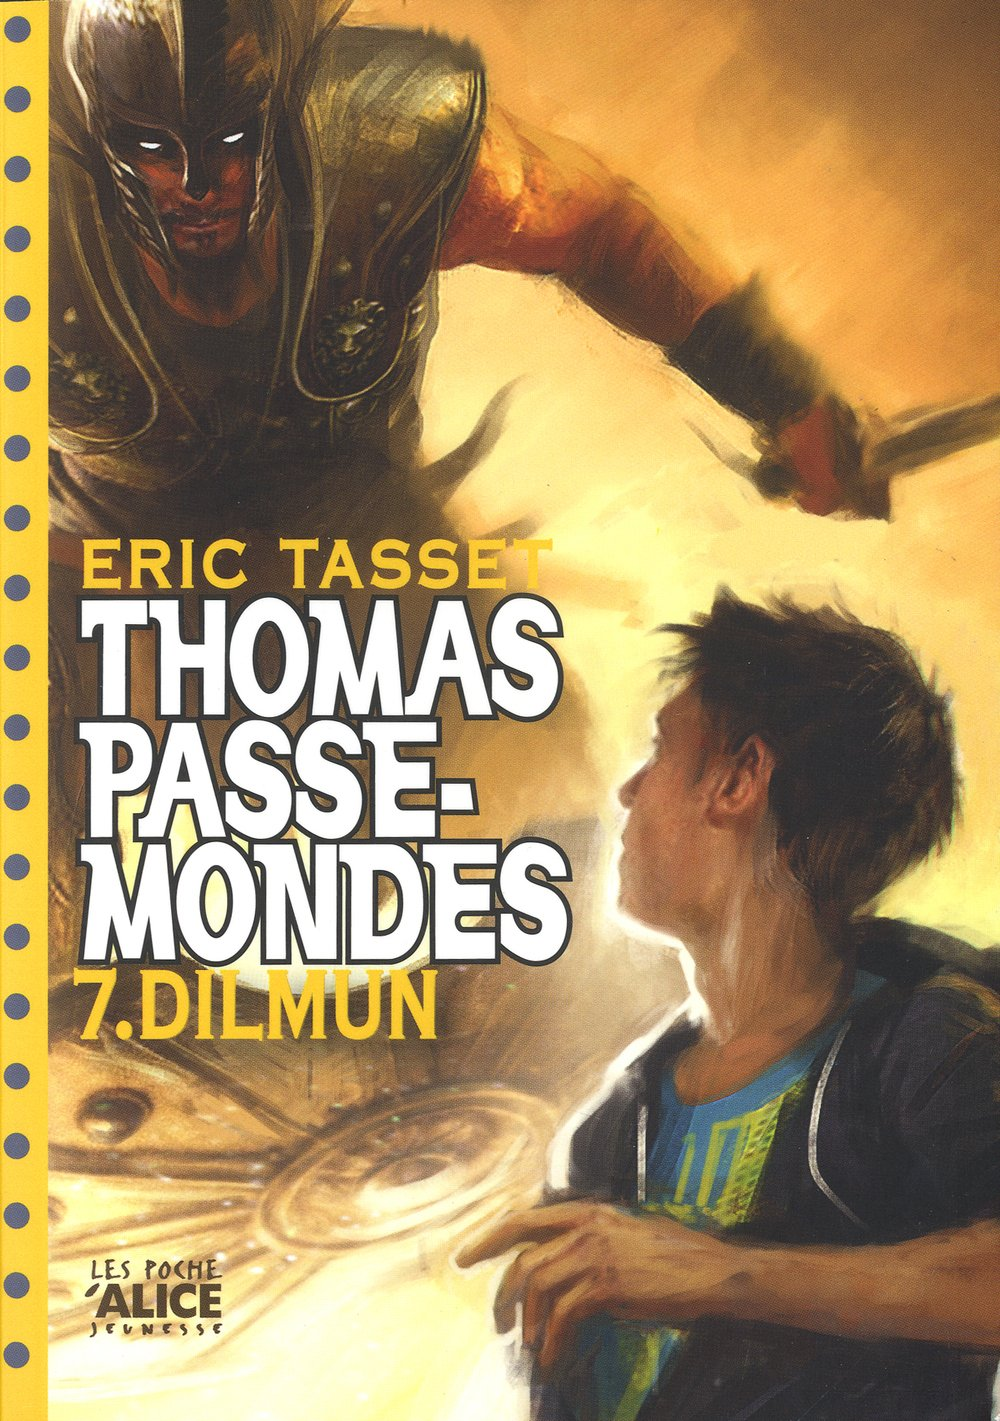 Download Thomas Passe-Mondes T7 - Dilmun (English and French Edition) pdf epub